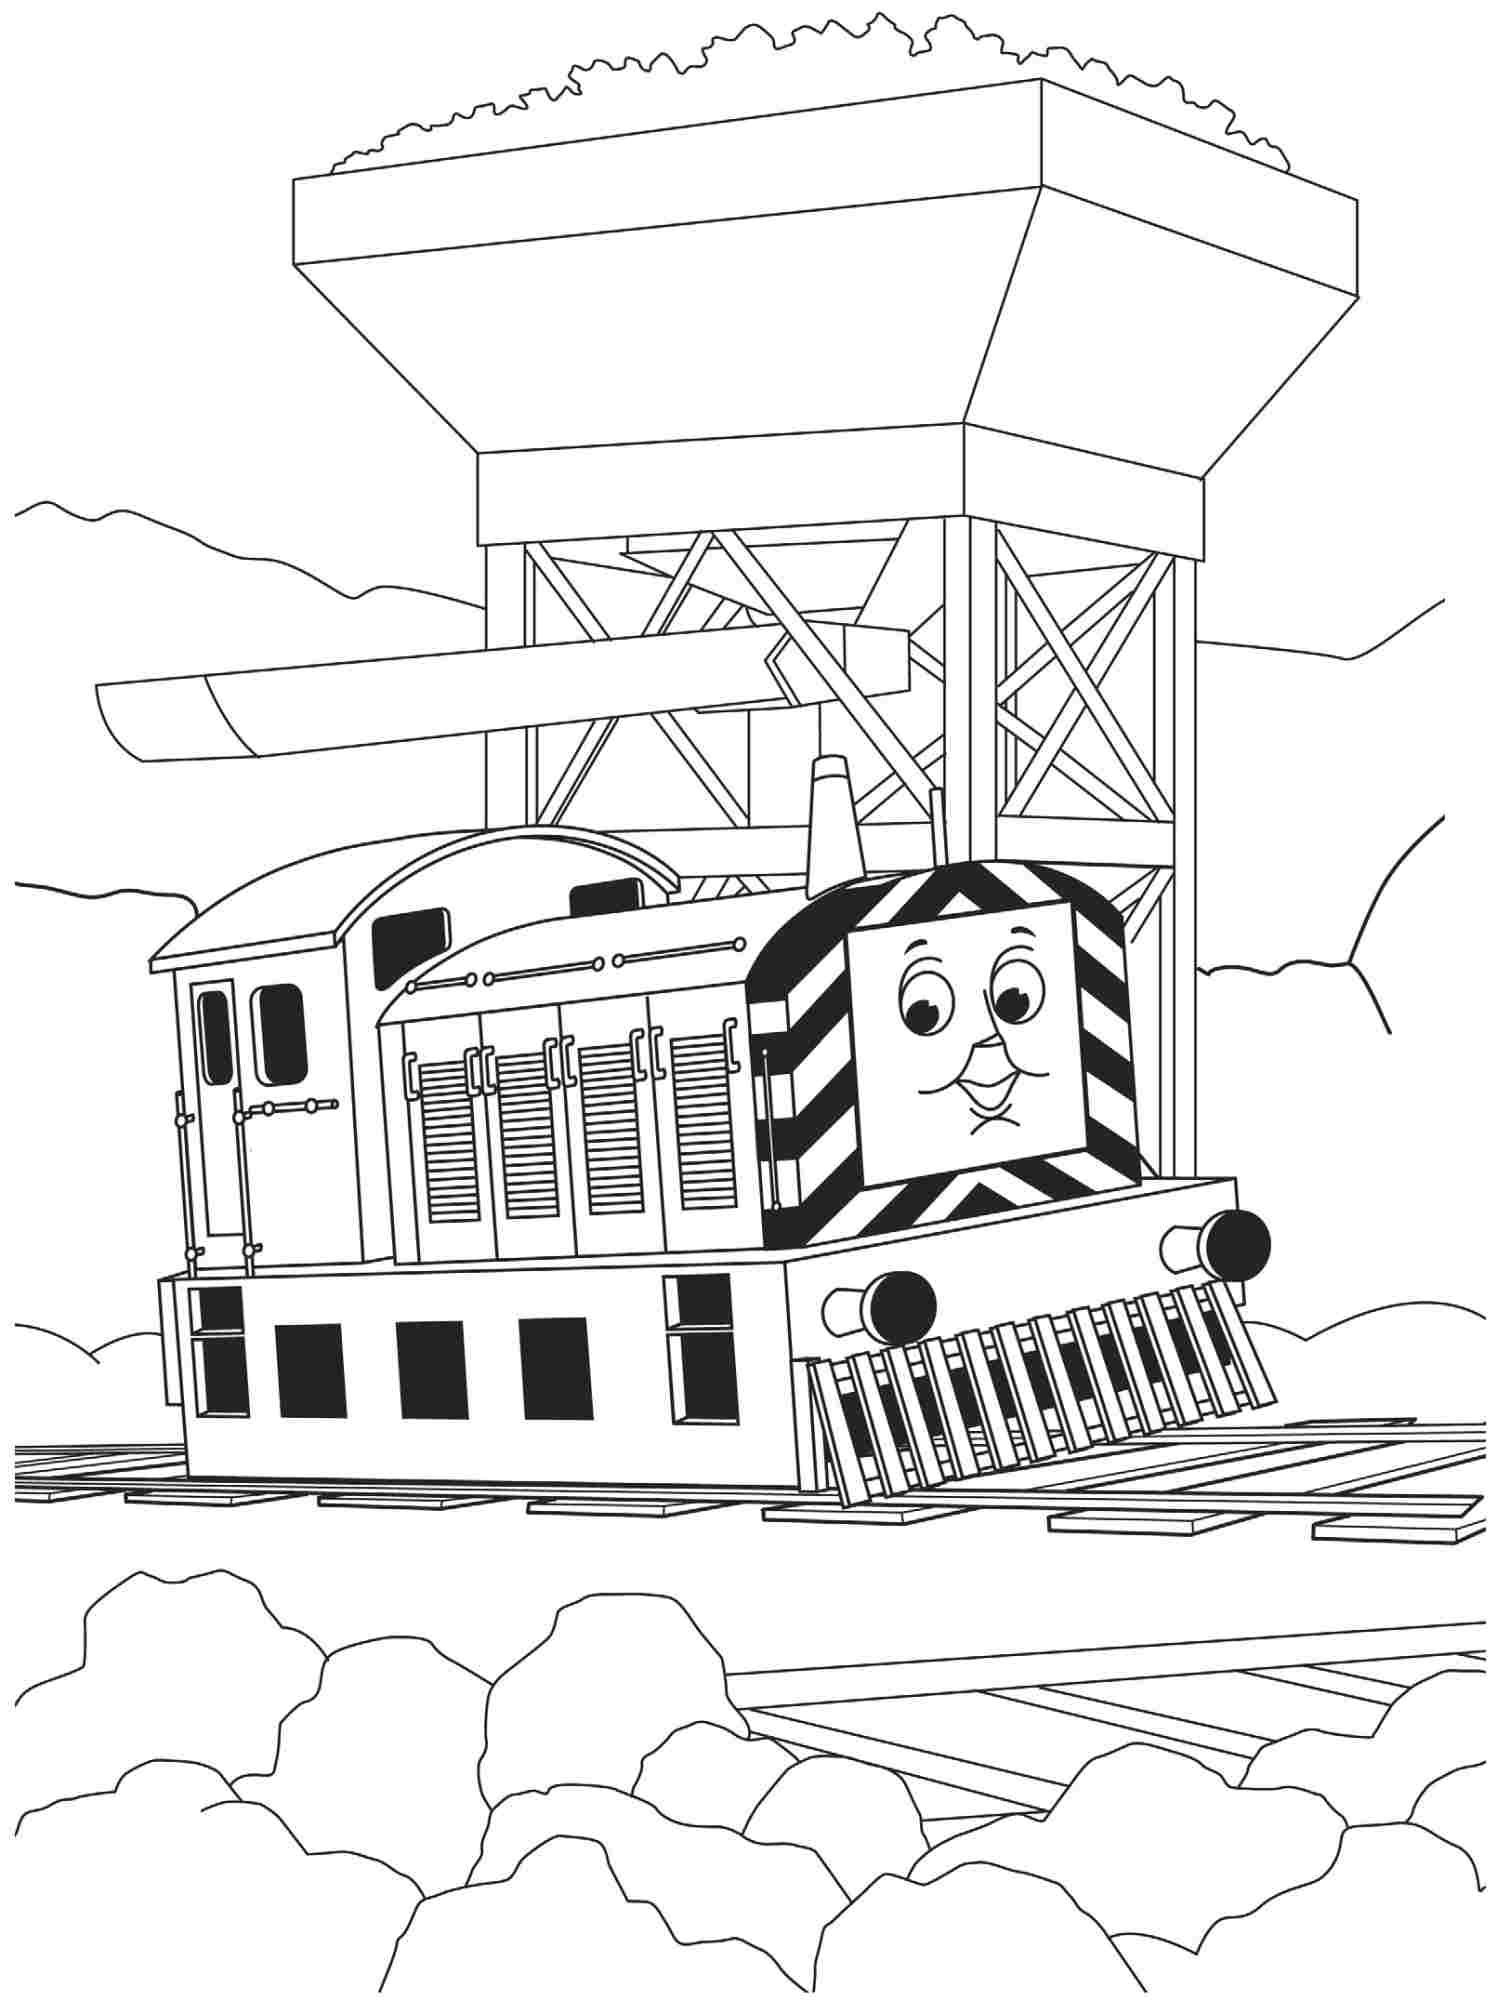 Coloring pages thomas the train - Cartoon Thomas The Train And Friends Coloring Pages Free For Boys